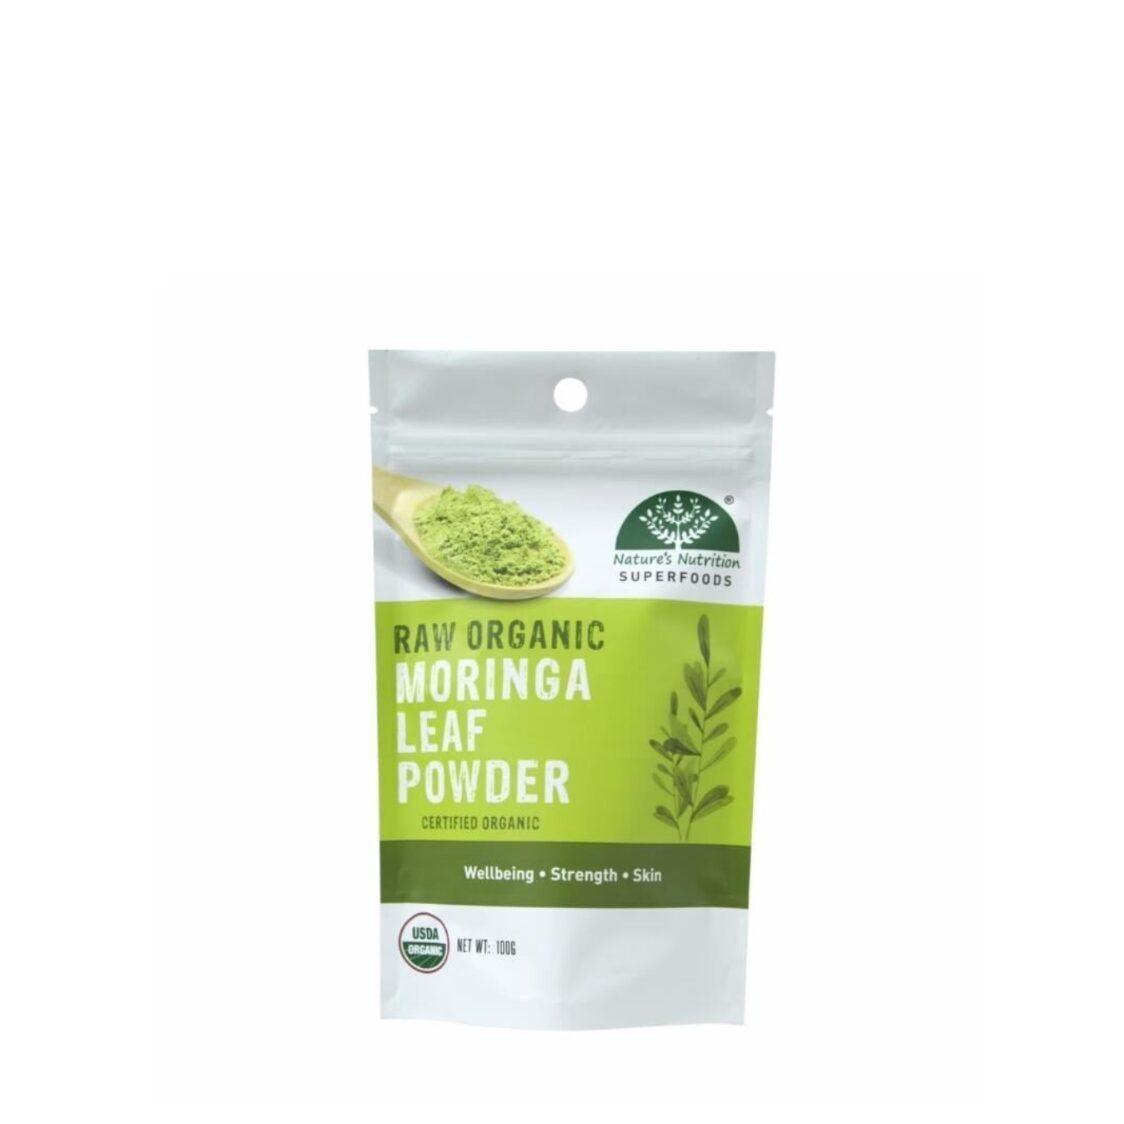 Natures Nutrition Organic Moringa Leaf Powder 100g